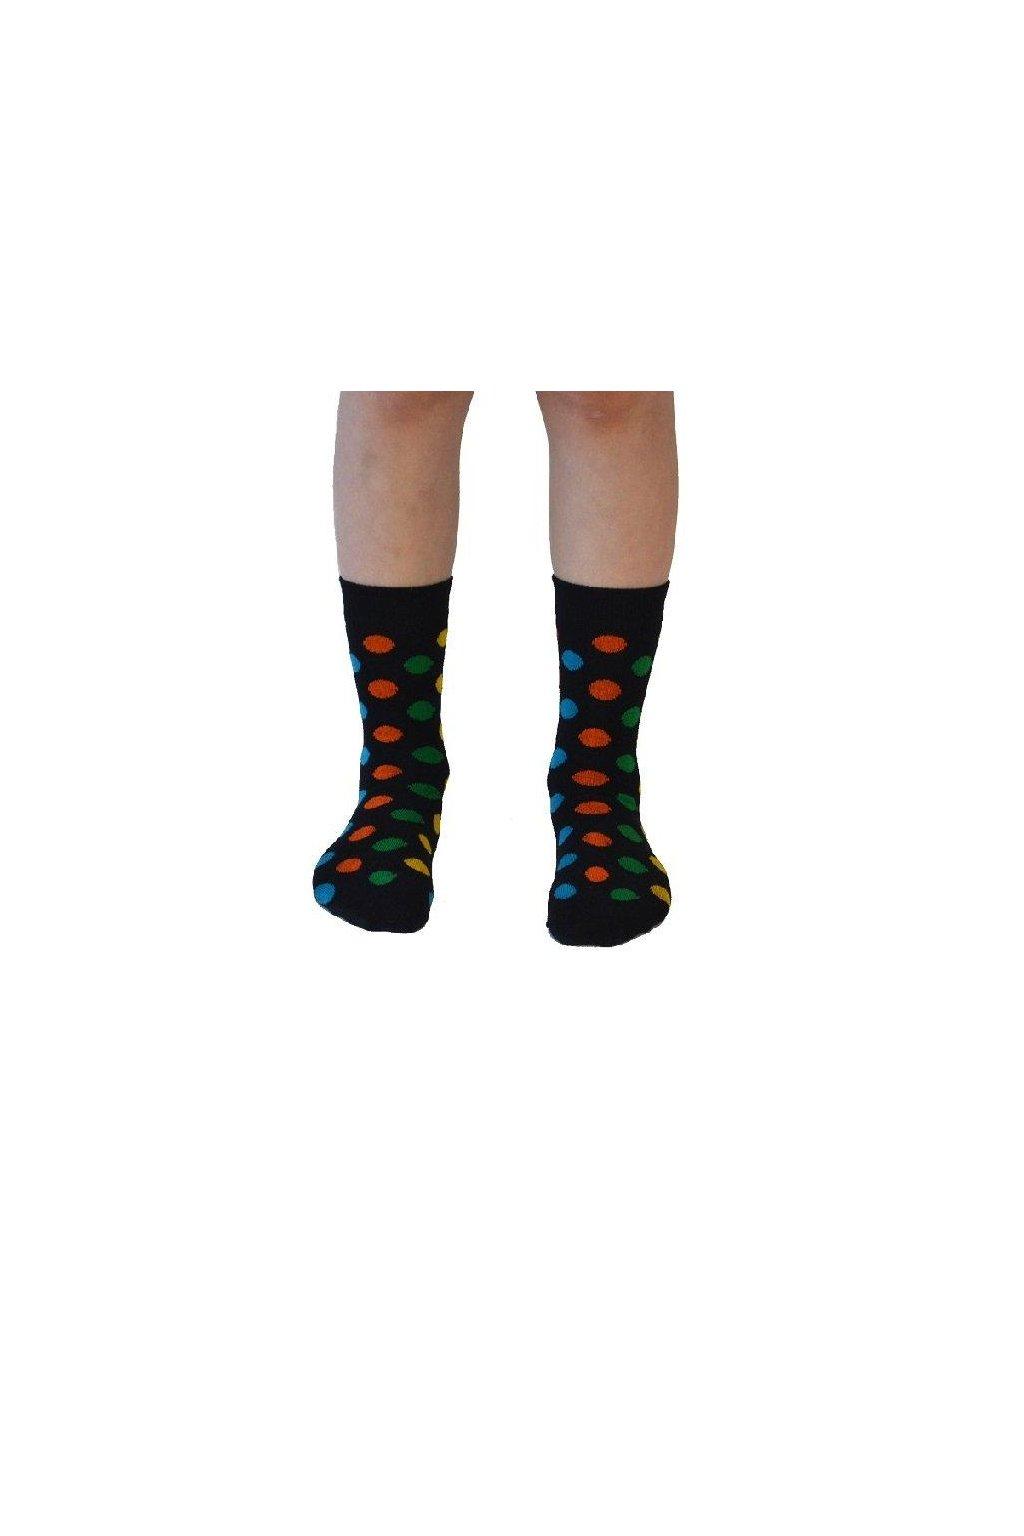 "Dětské ponožky z biobavlny ""Sundberg"" (Velikost 19-22)"